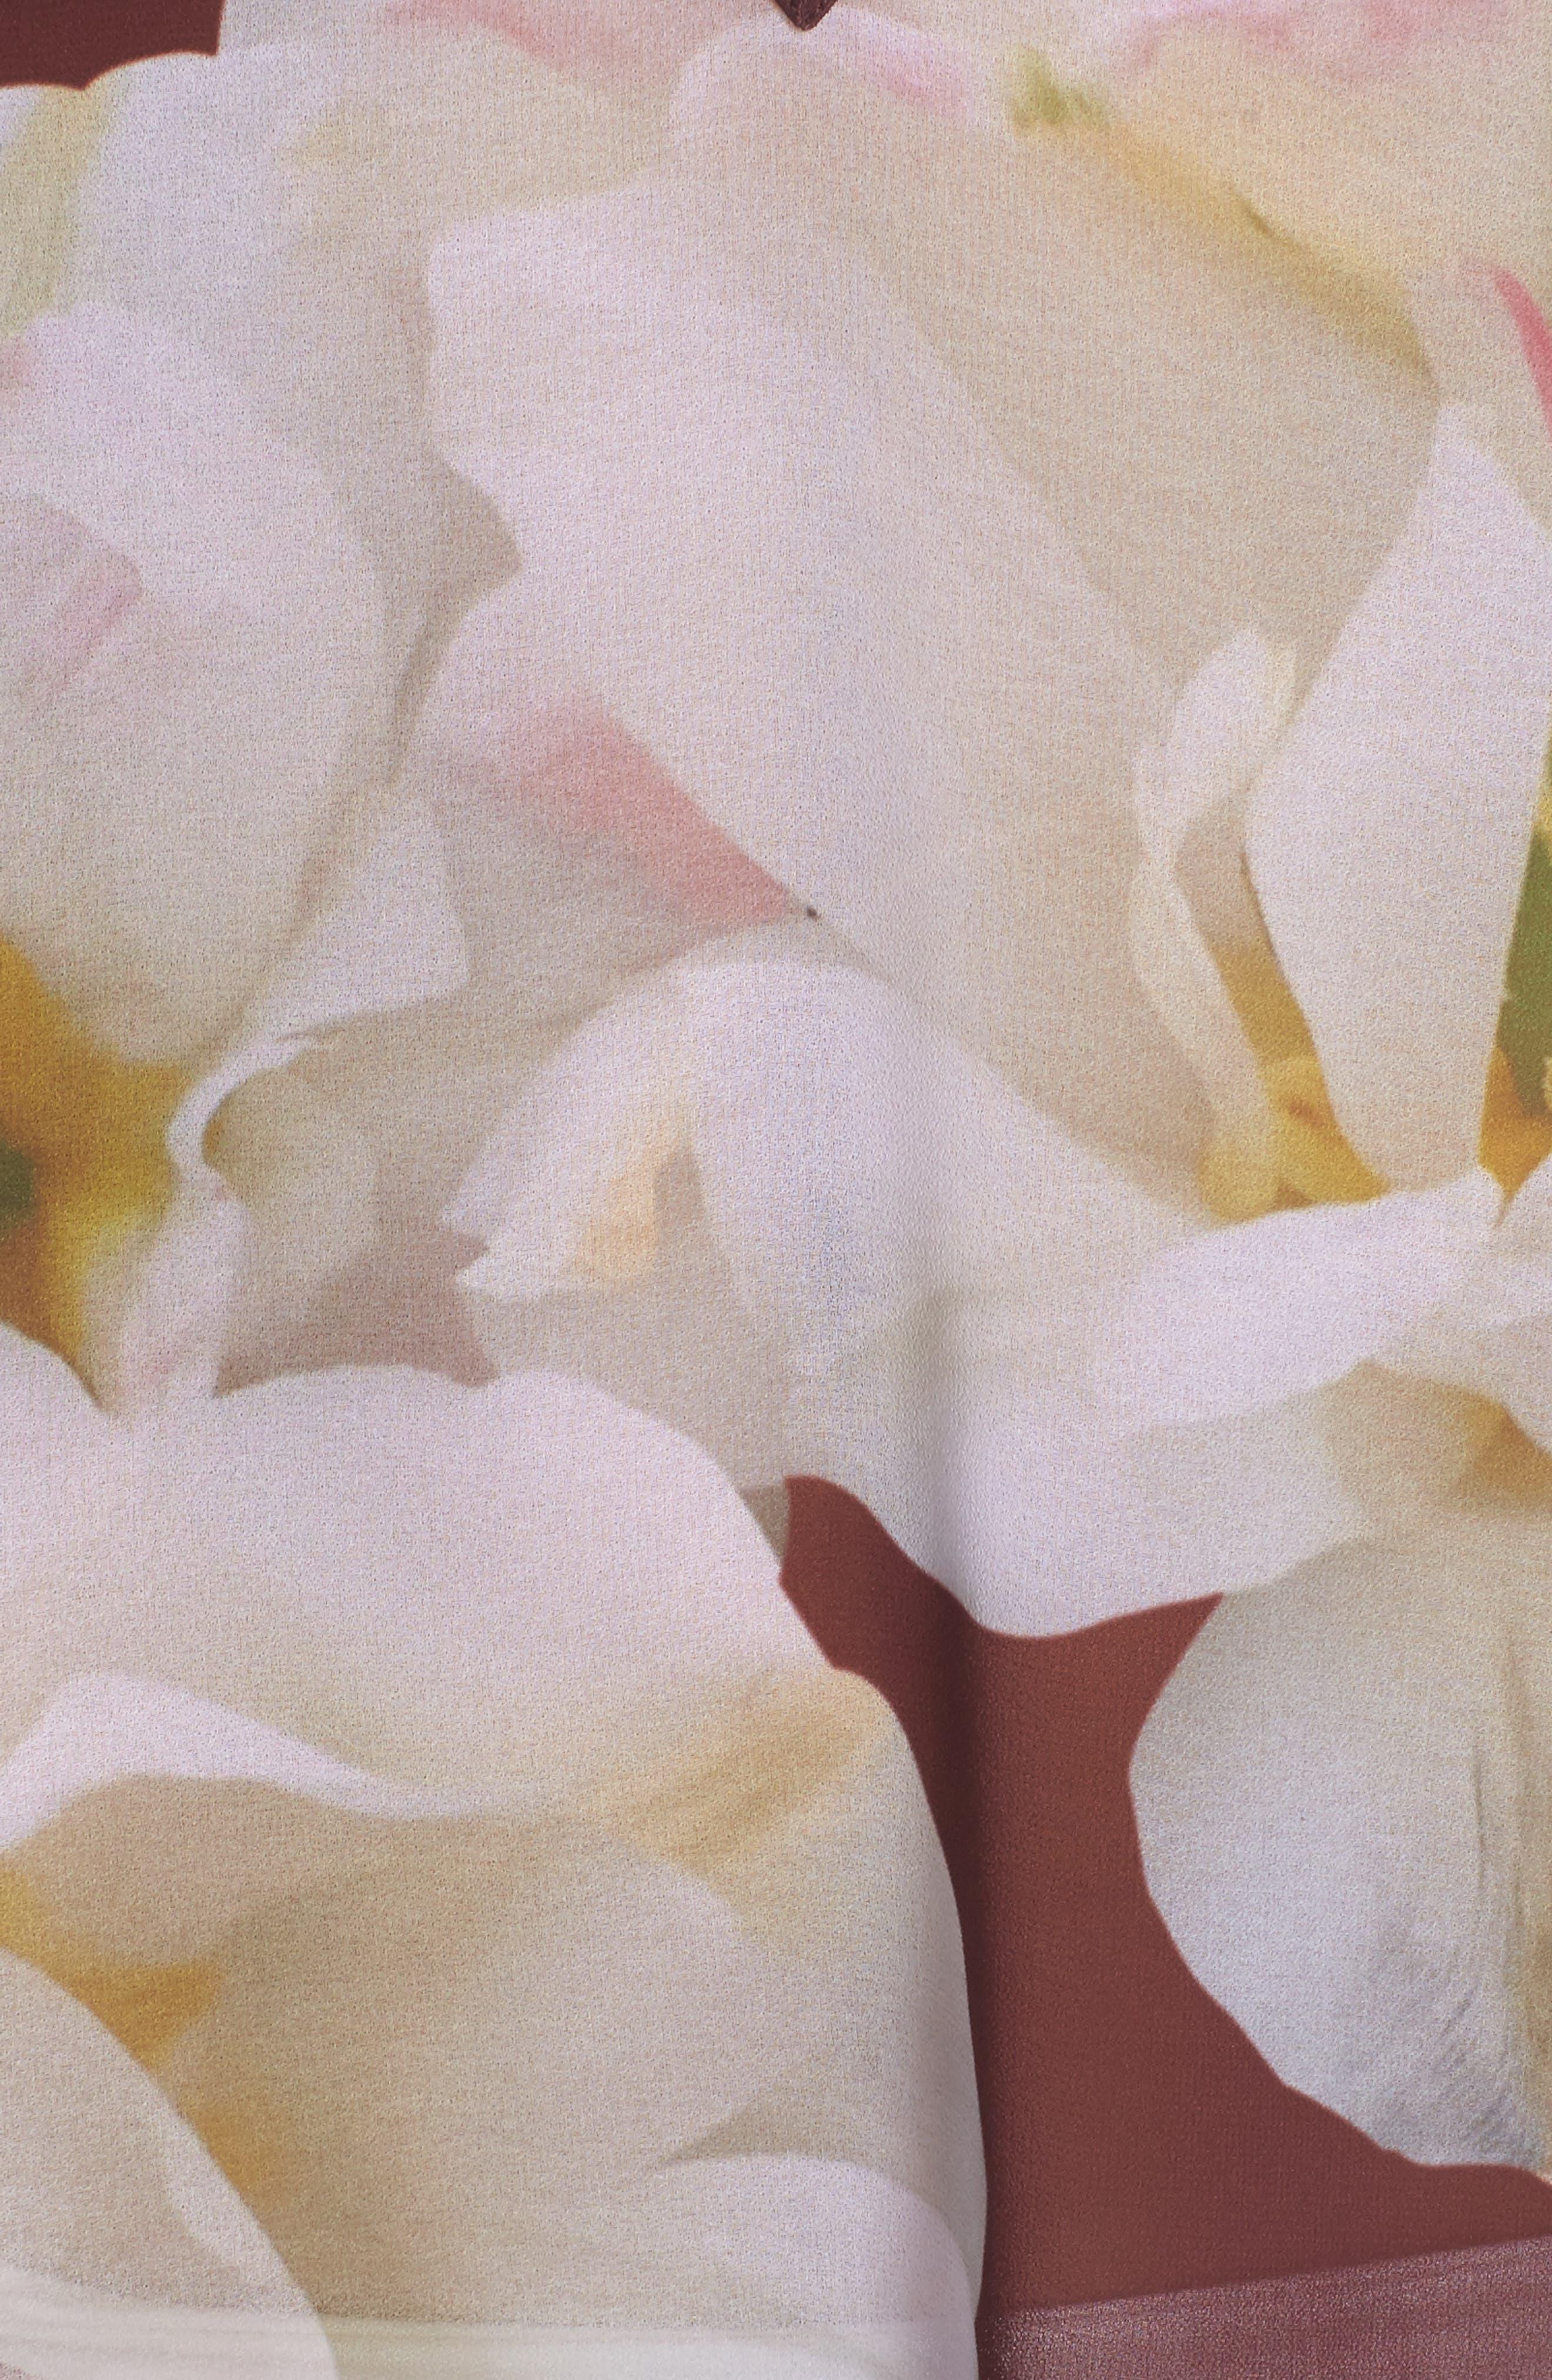 Garsa Gardenia Cover-Up Tunic,                             Alternate thumbnail 5, color,                             930